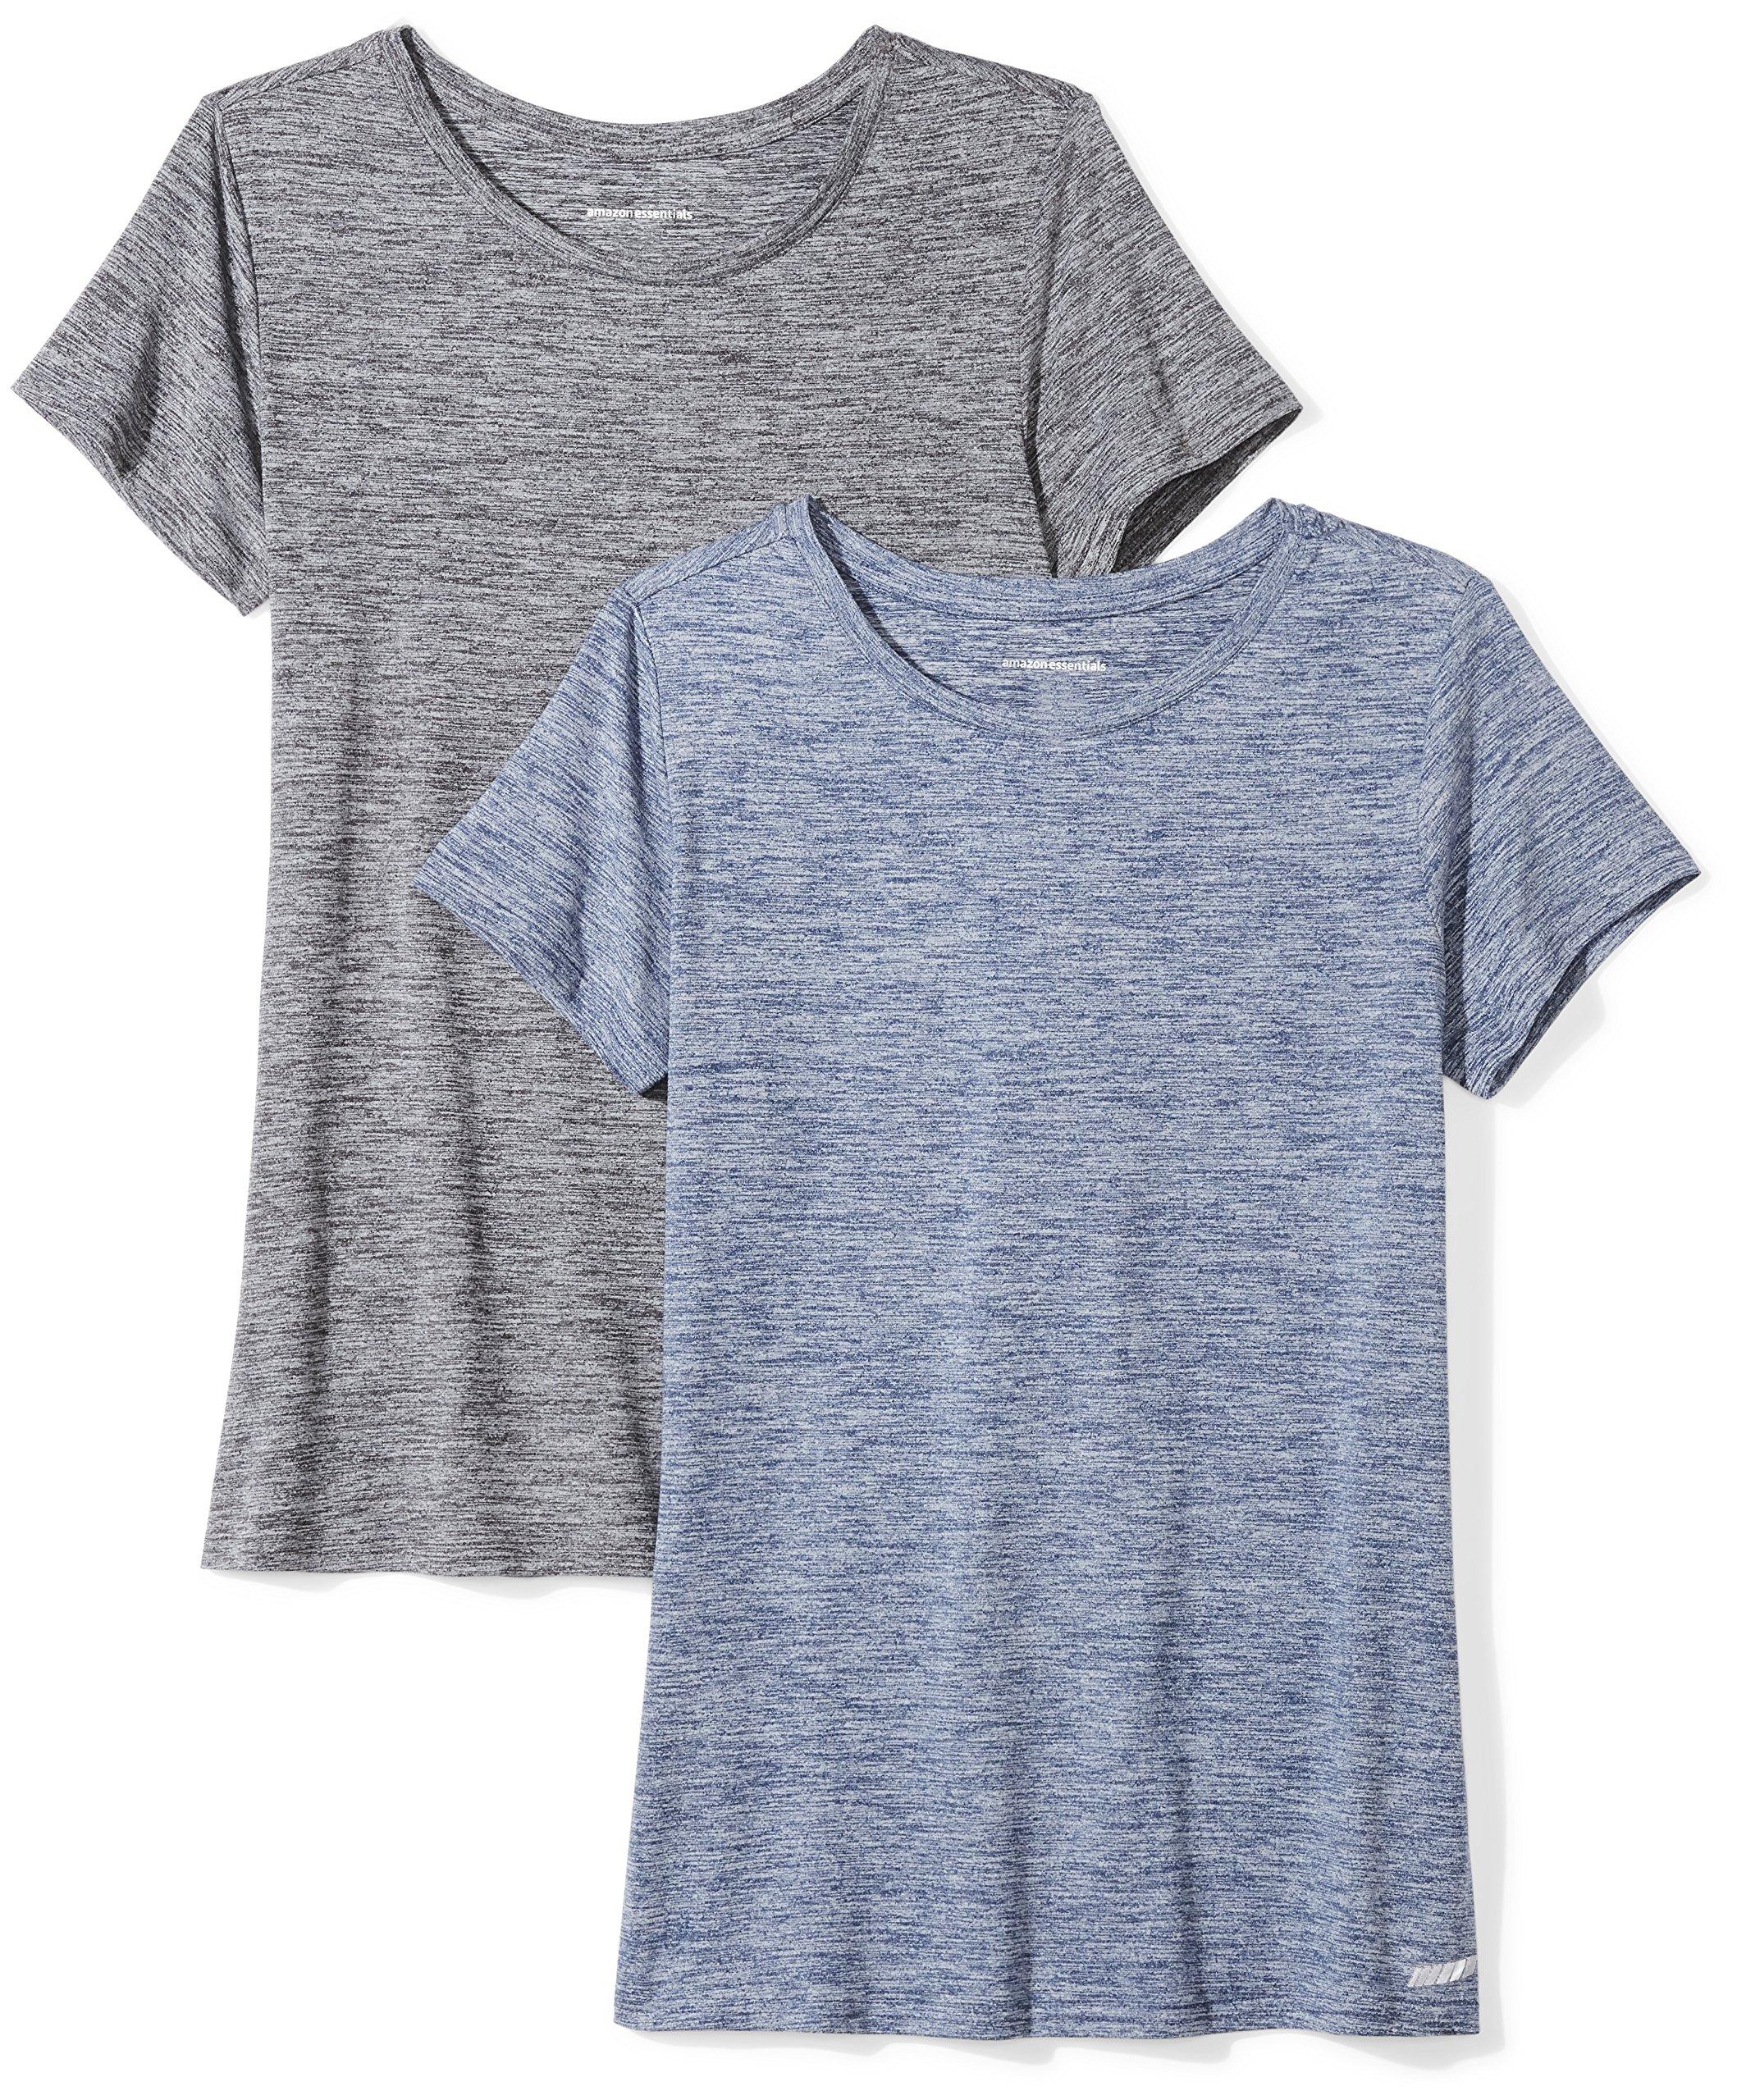 Amazon Essentials Women's 2-Pack Tech Stretch Short-Sleeve Crewneck T-Shirt Shirt, Black Heather/Navy Heather, XX-Large